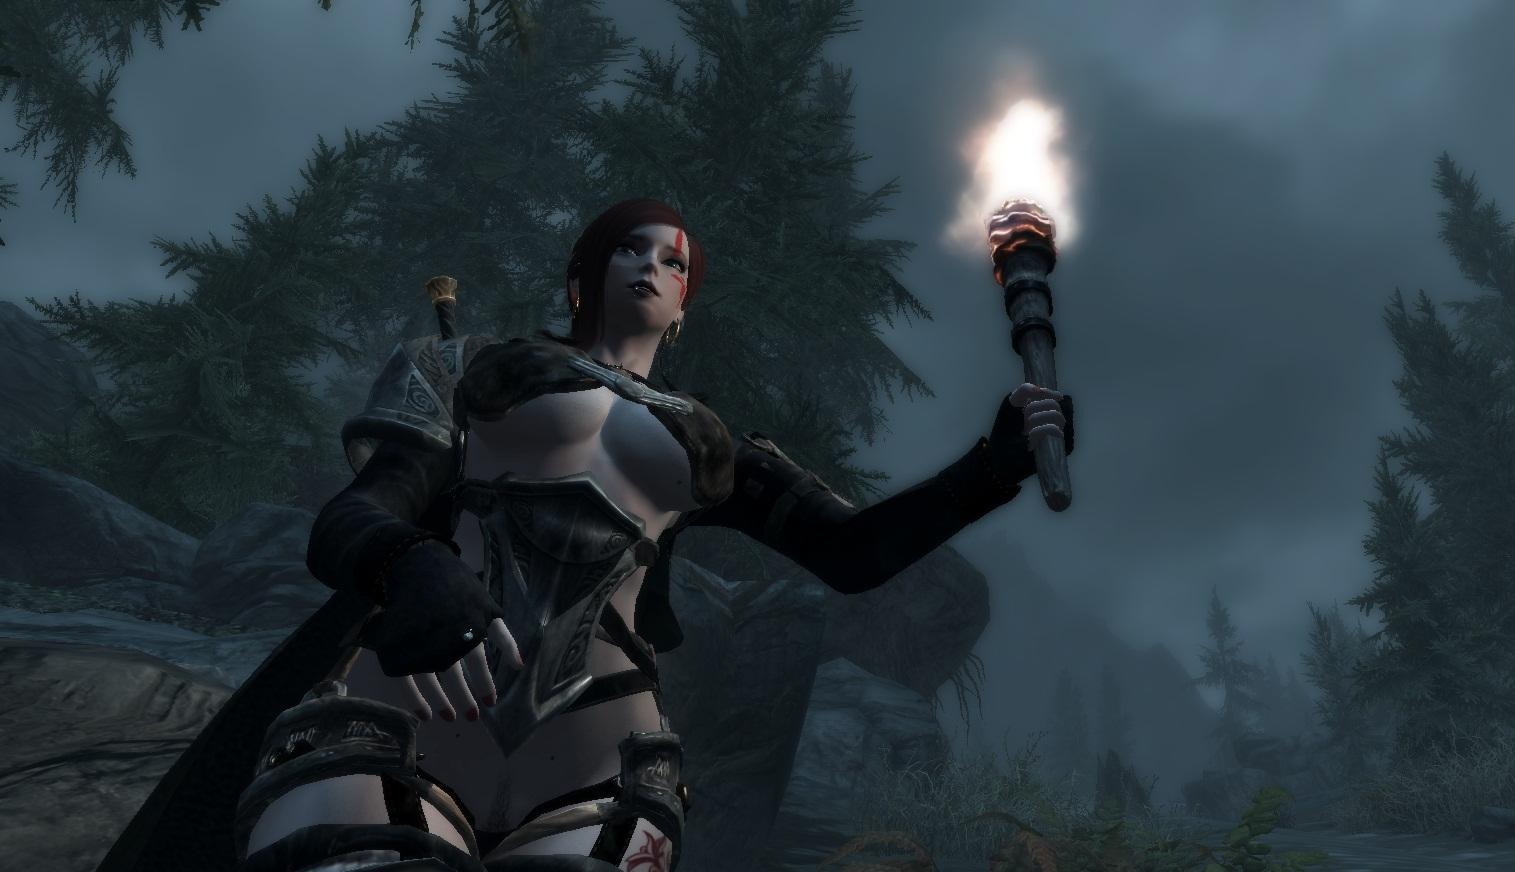 7.jpg - Elder Scrolls 5: Skyrim, the